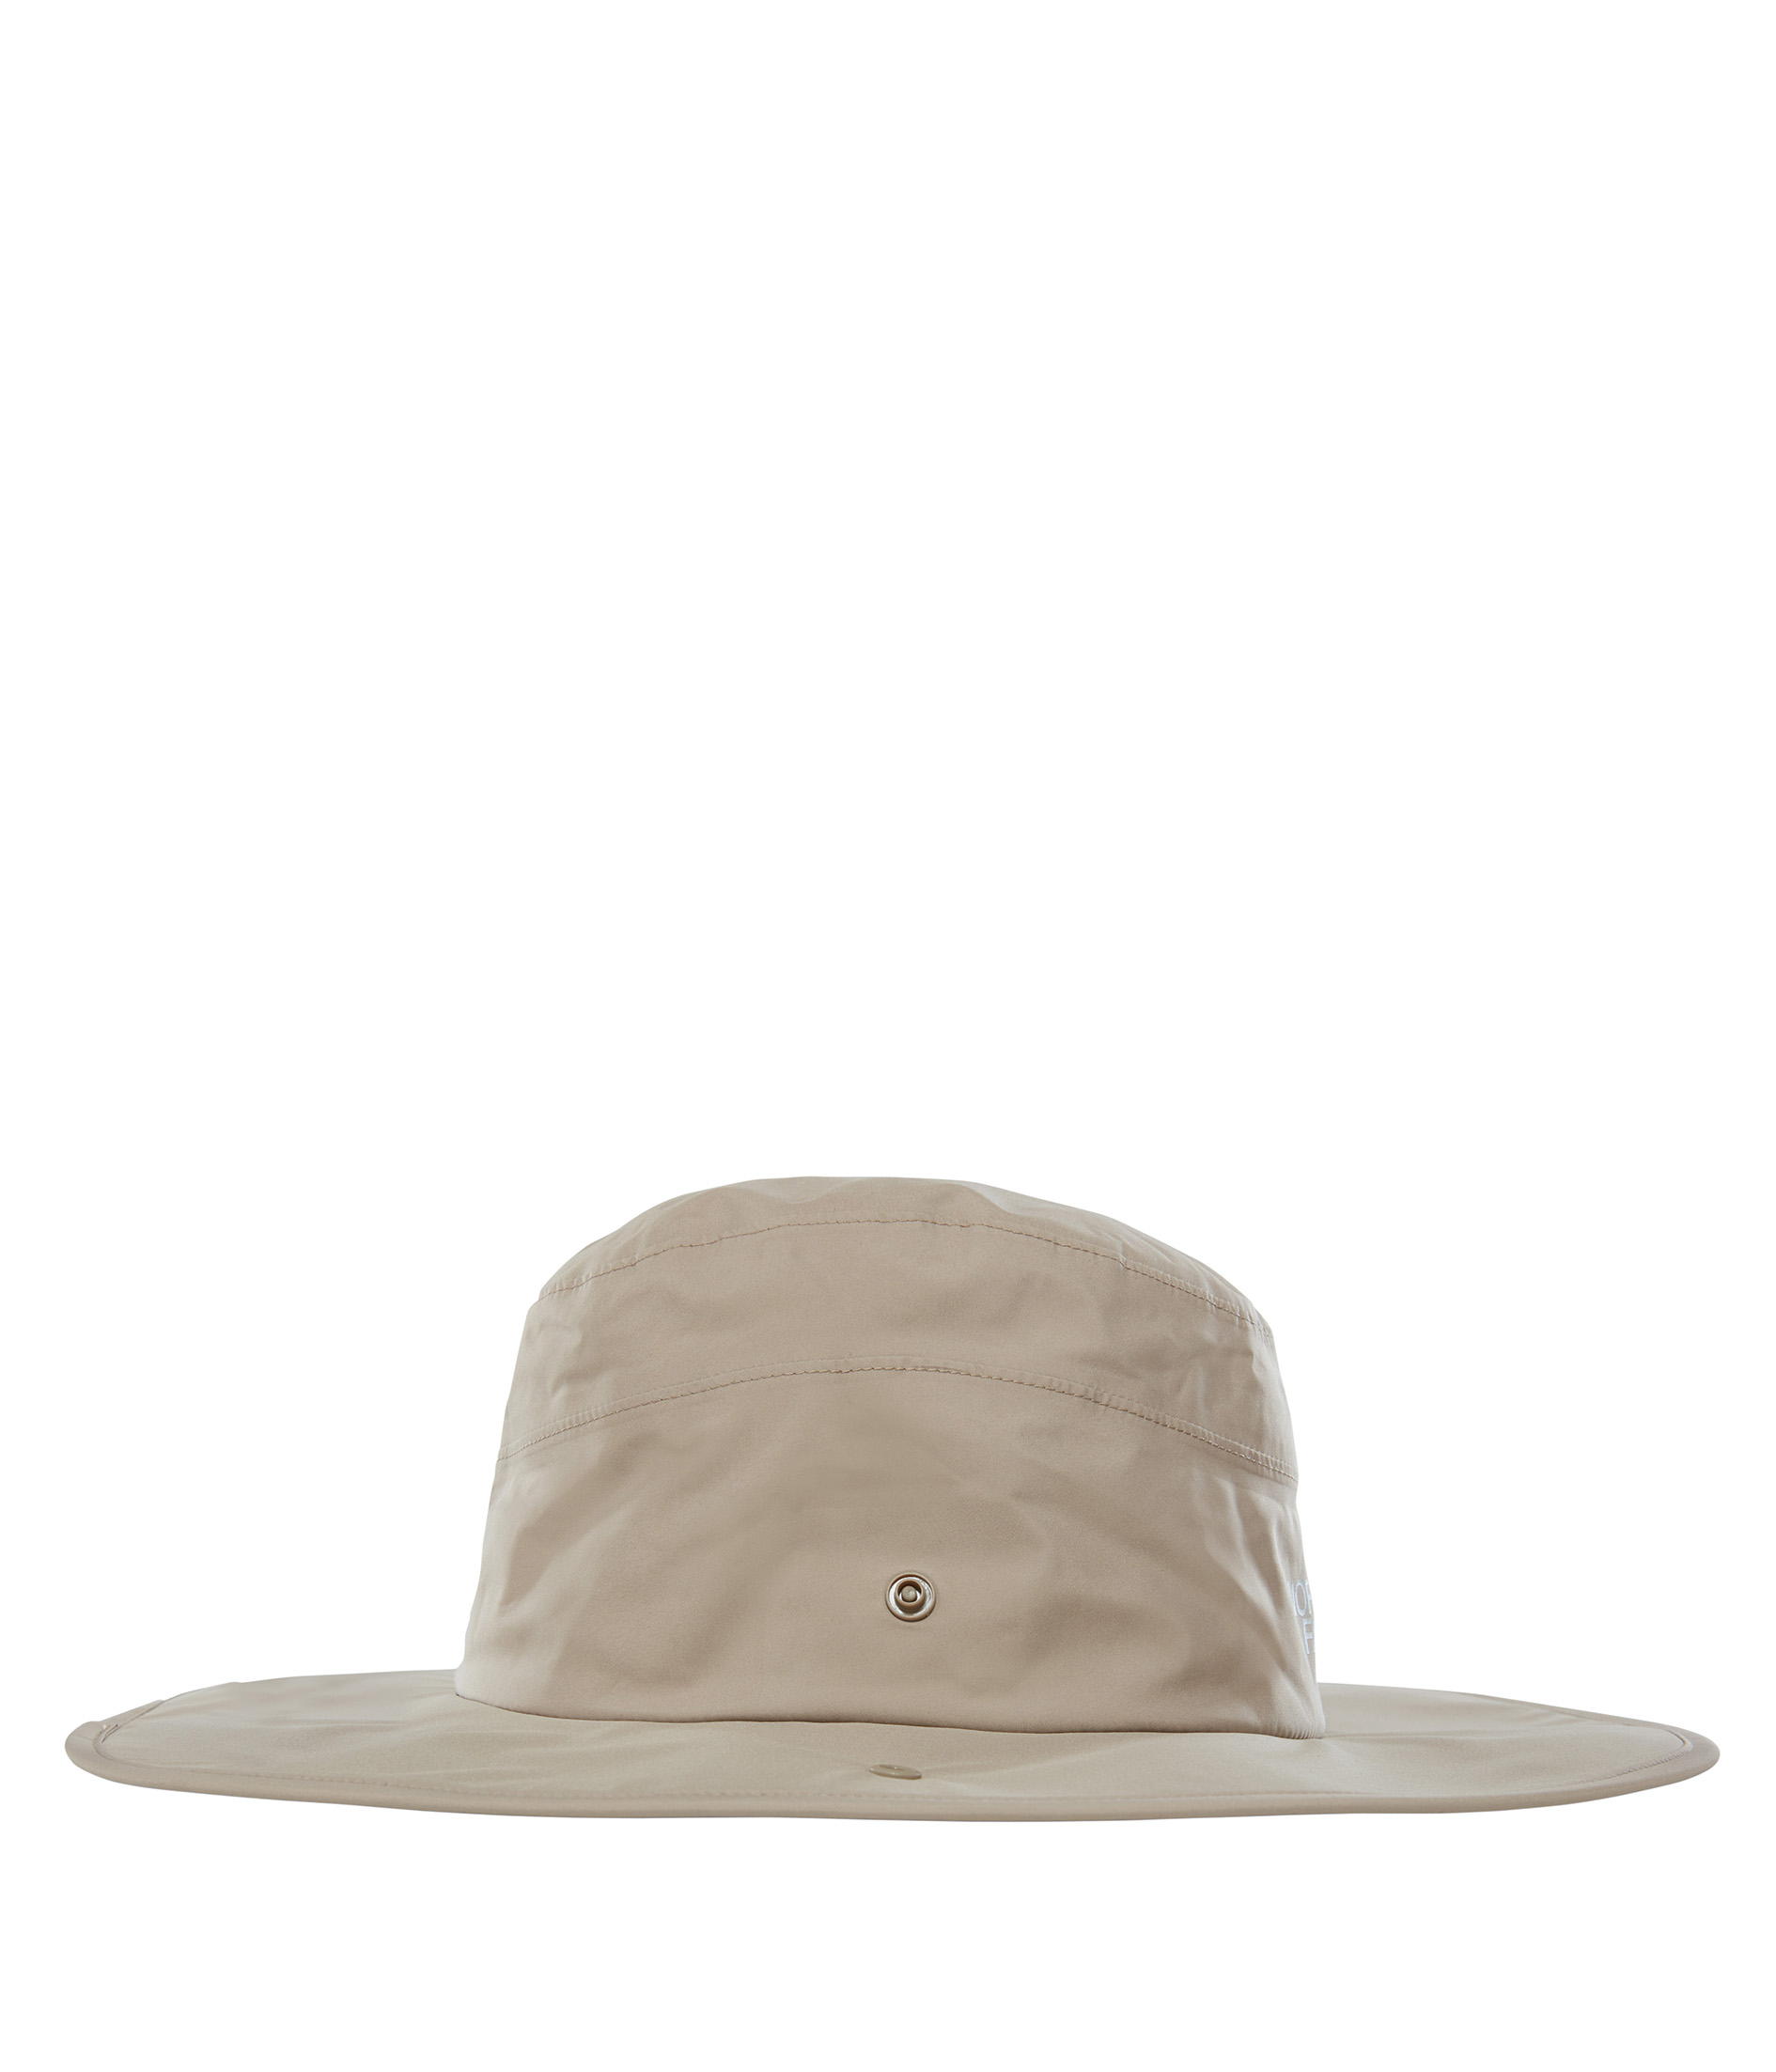 396c02c59b3 The North Face GTX hiker hat -